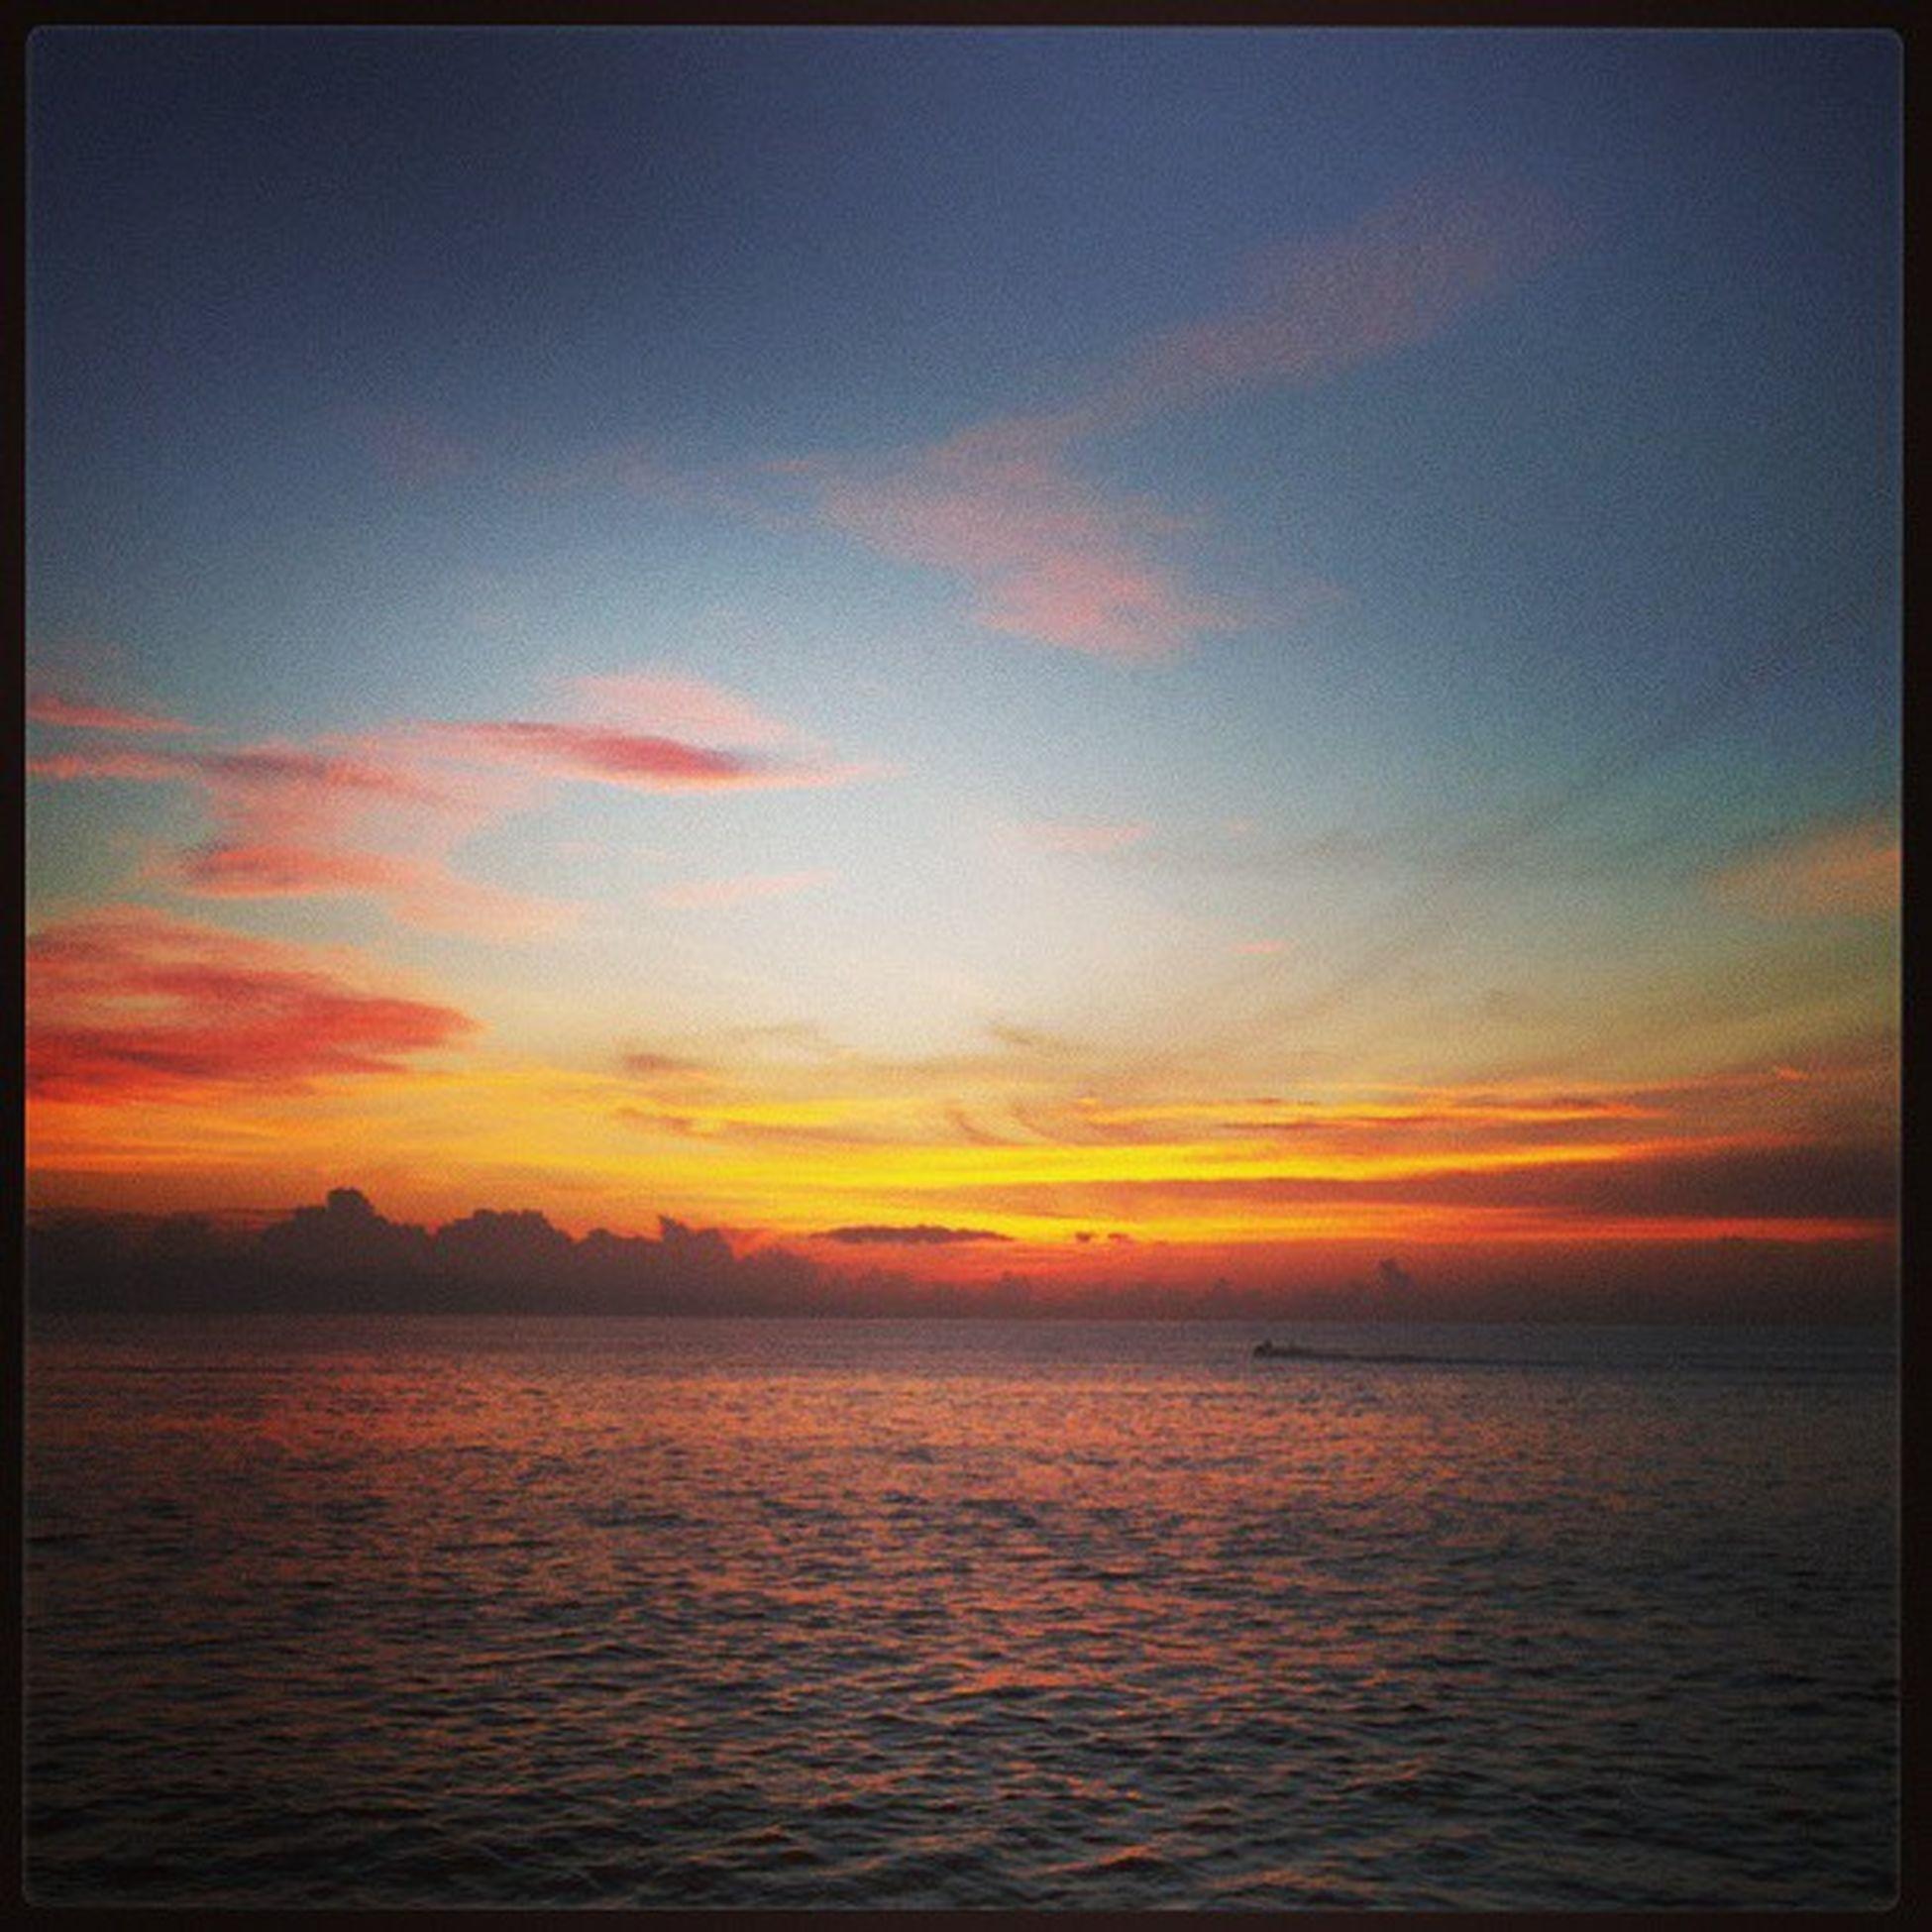 Sunrise @ sanur beach Bali Beach Bali Sunrise INDONESIA Beautiful Instagram Instadaily Instapic Instamood Instacool Tag4likes Cool View Like4like Dailypost Baliview Cute Instadaily Instagrape Instamood Instahappy